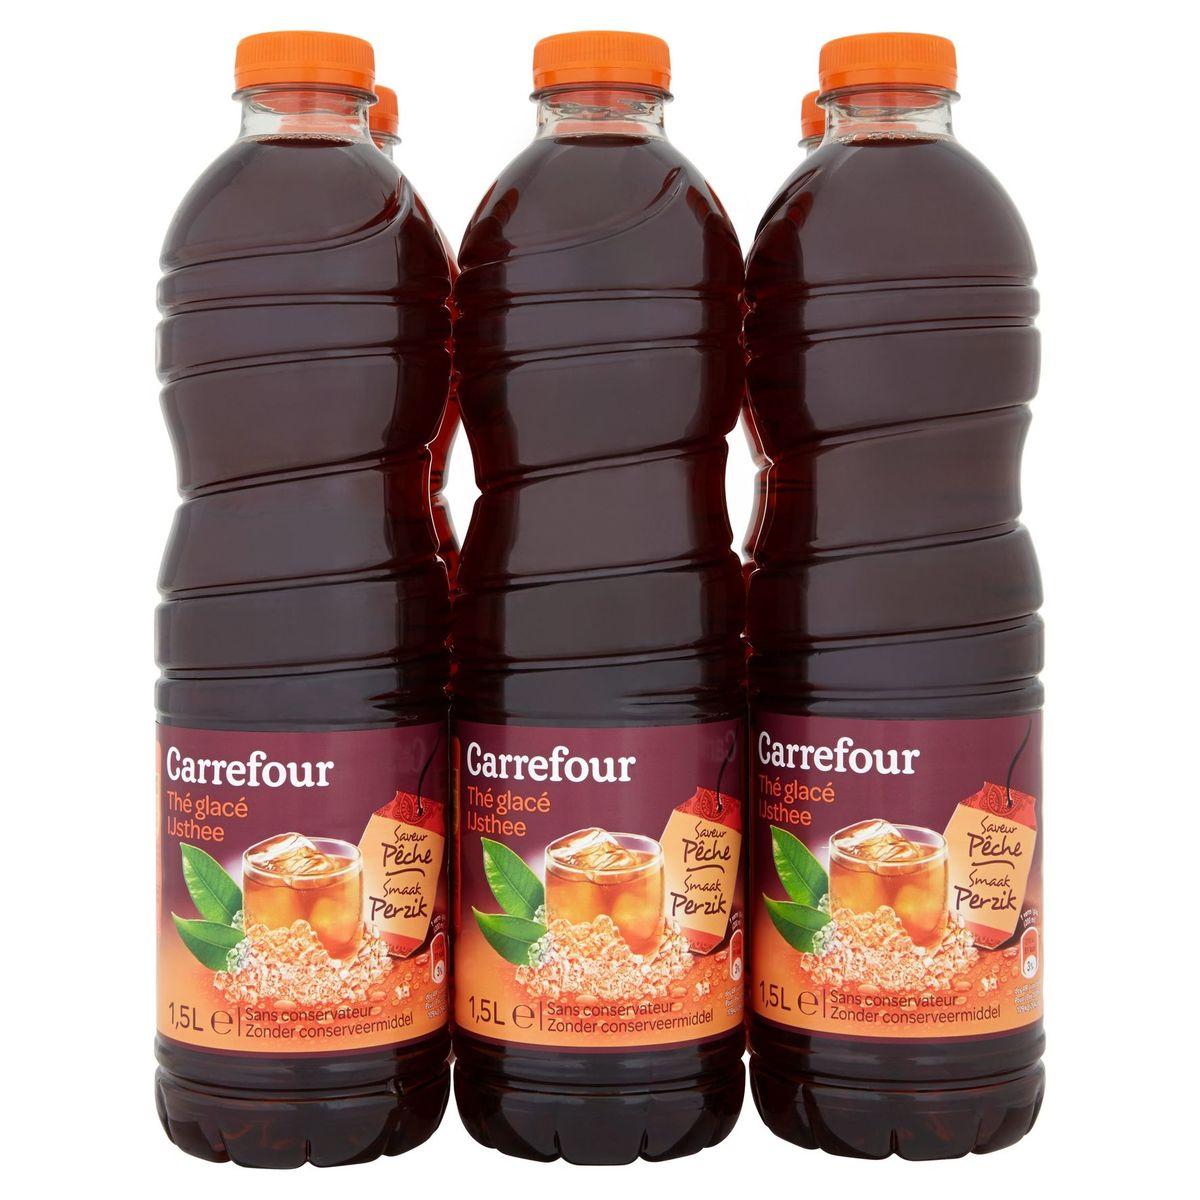 Carrefour Ijsthee Smaak Perzik 6 x 1.5 L